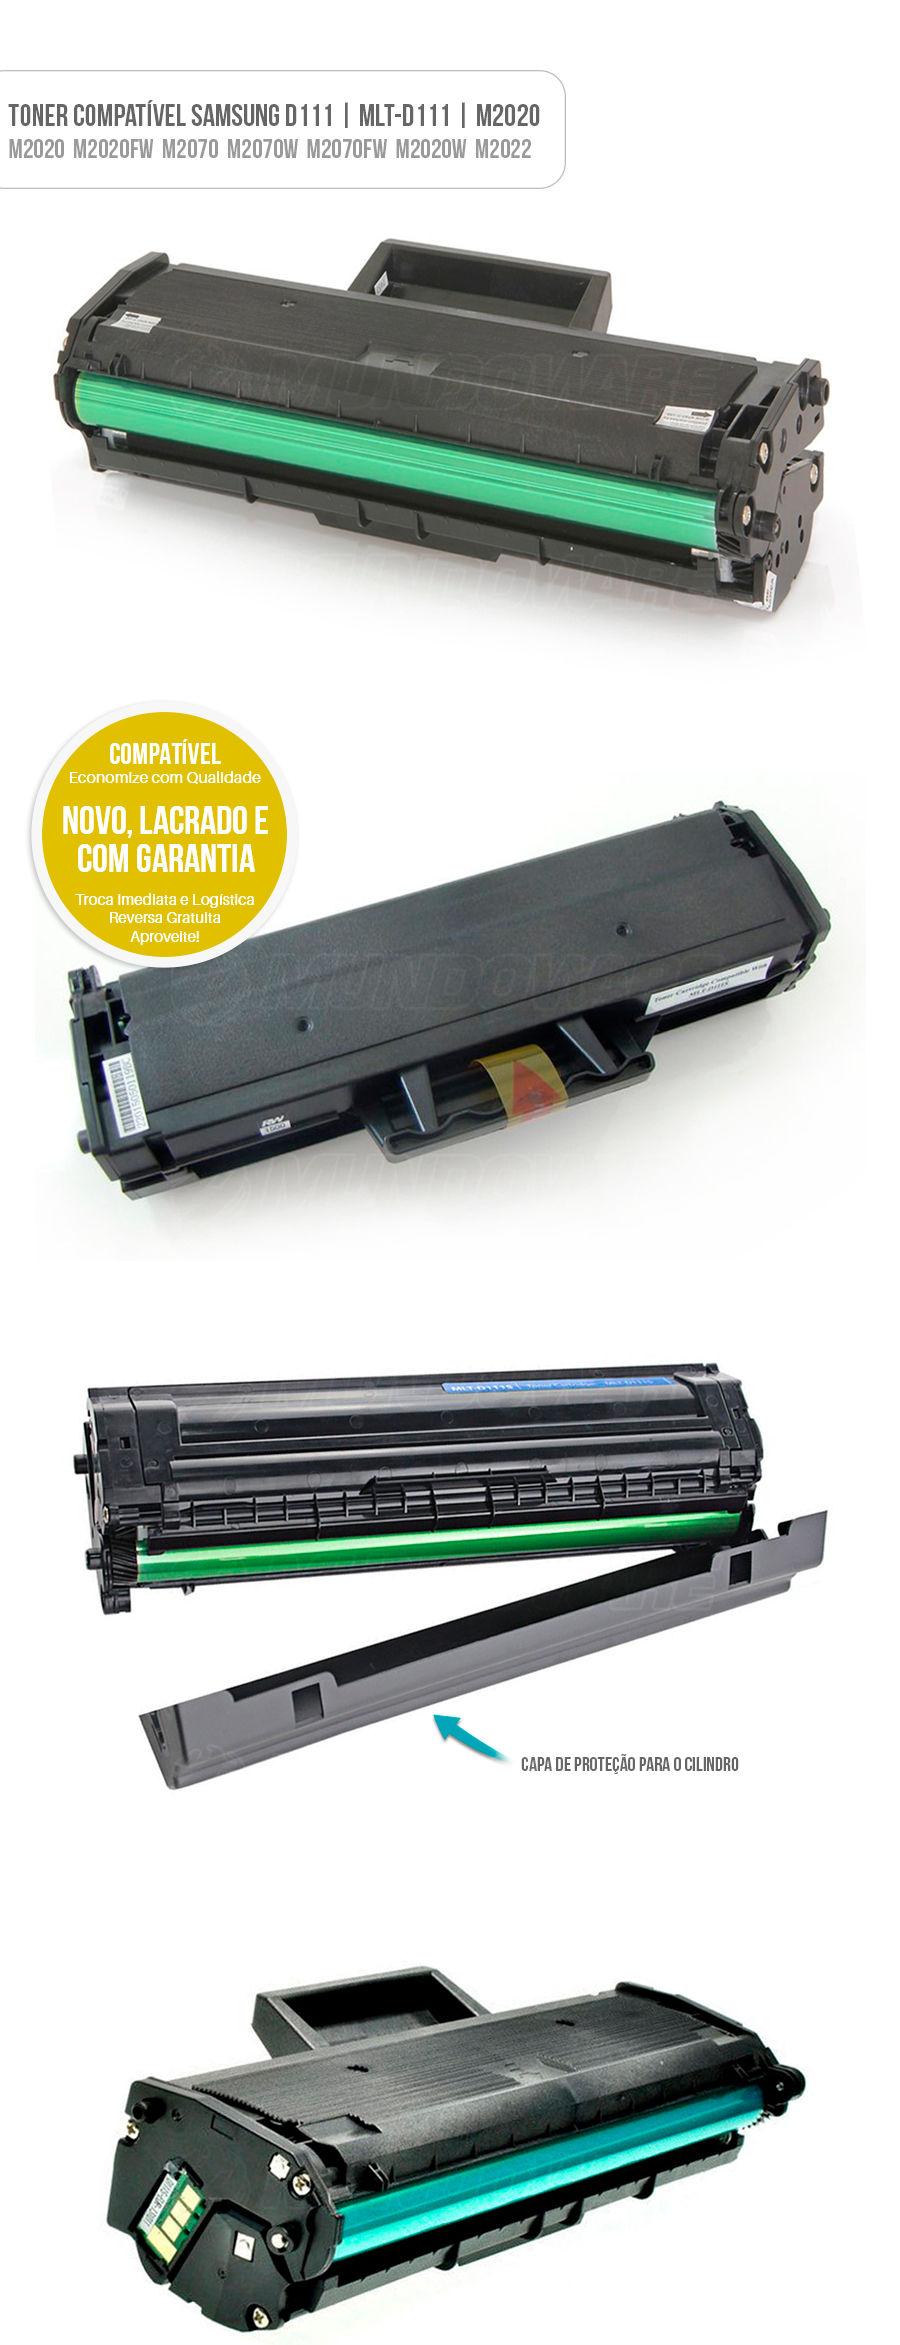 Xpress M2020 M2020W M2020FW M2022 M2070 M2070W M2070FW Tonner